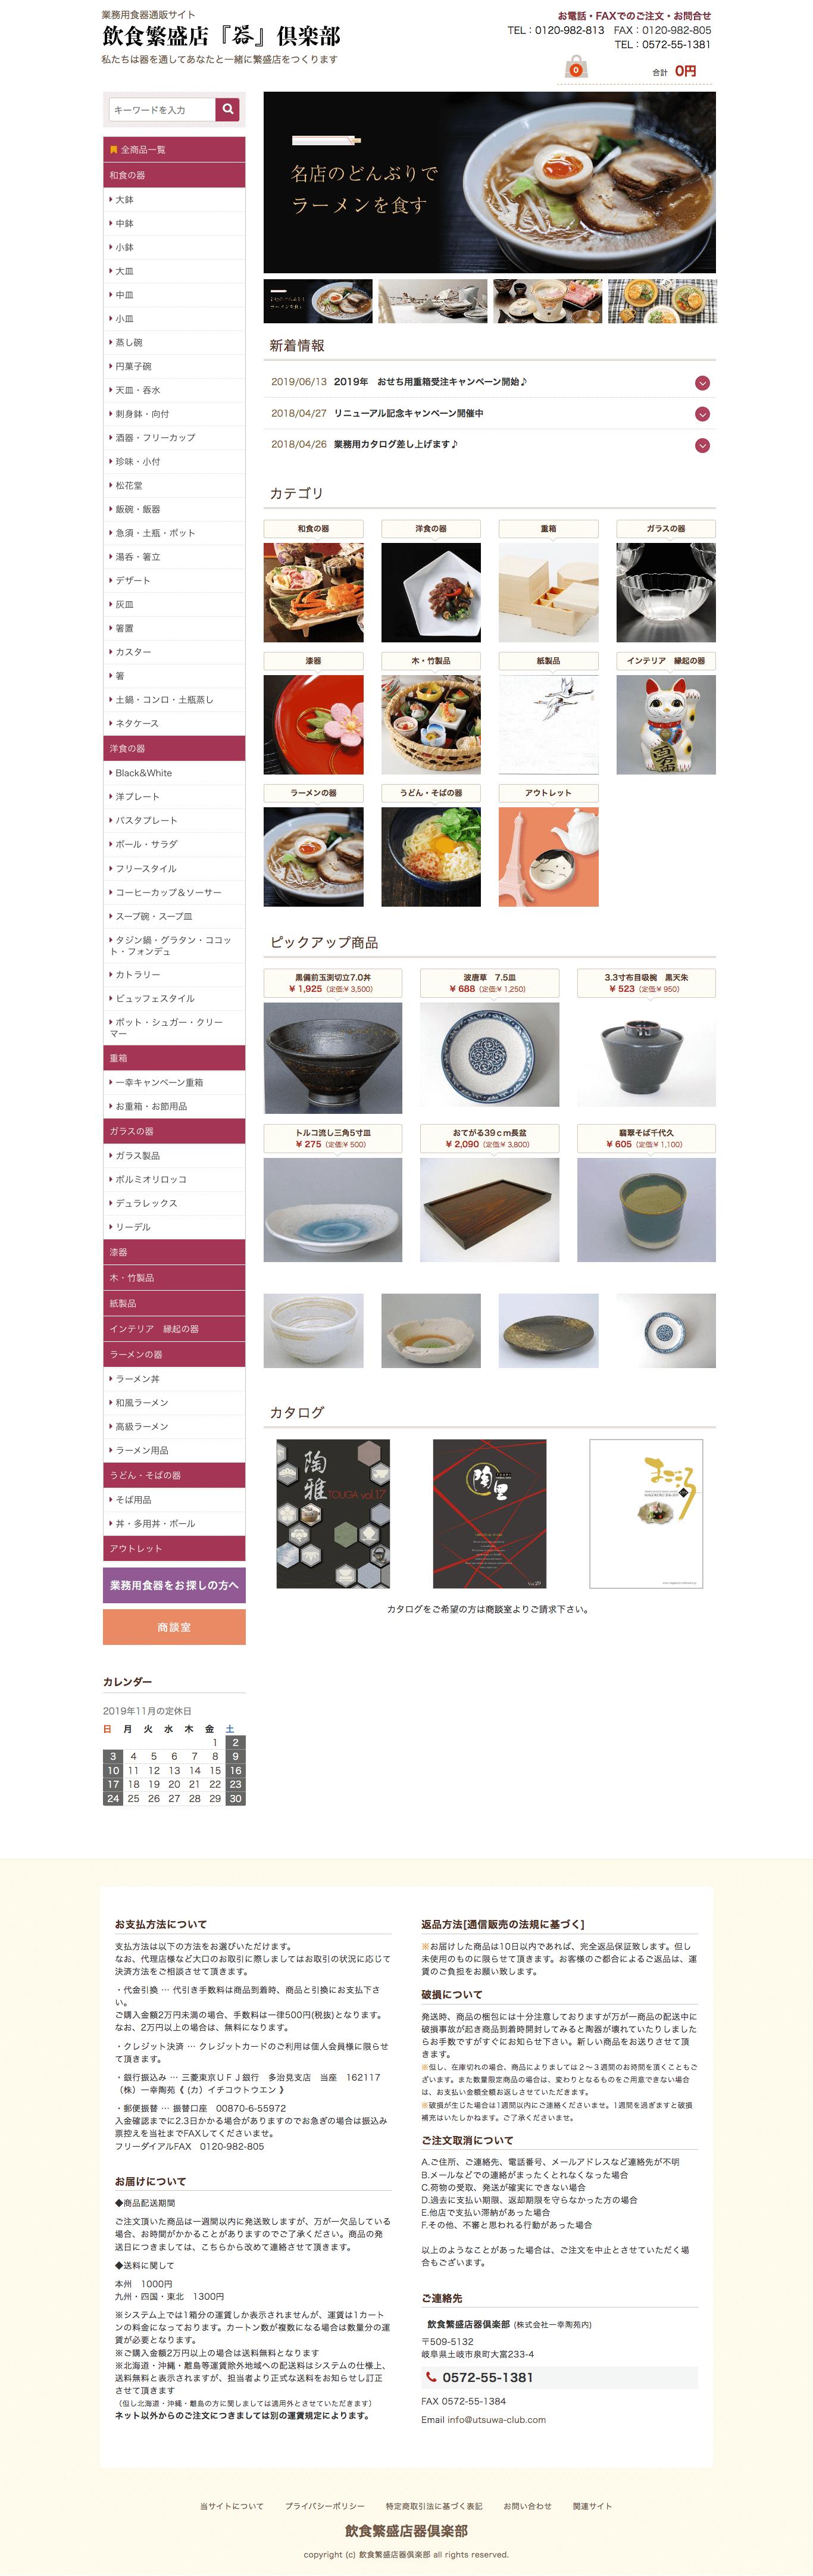 飲食繁盛店『器』倶楽部pcイメージ